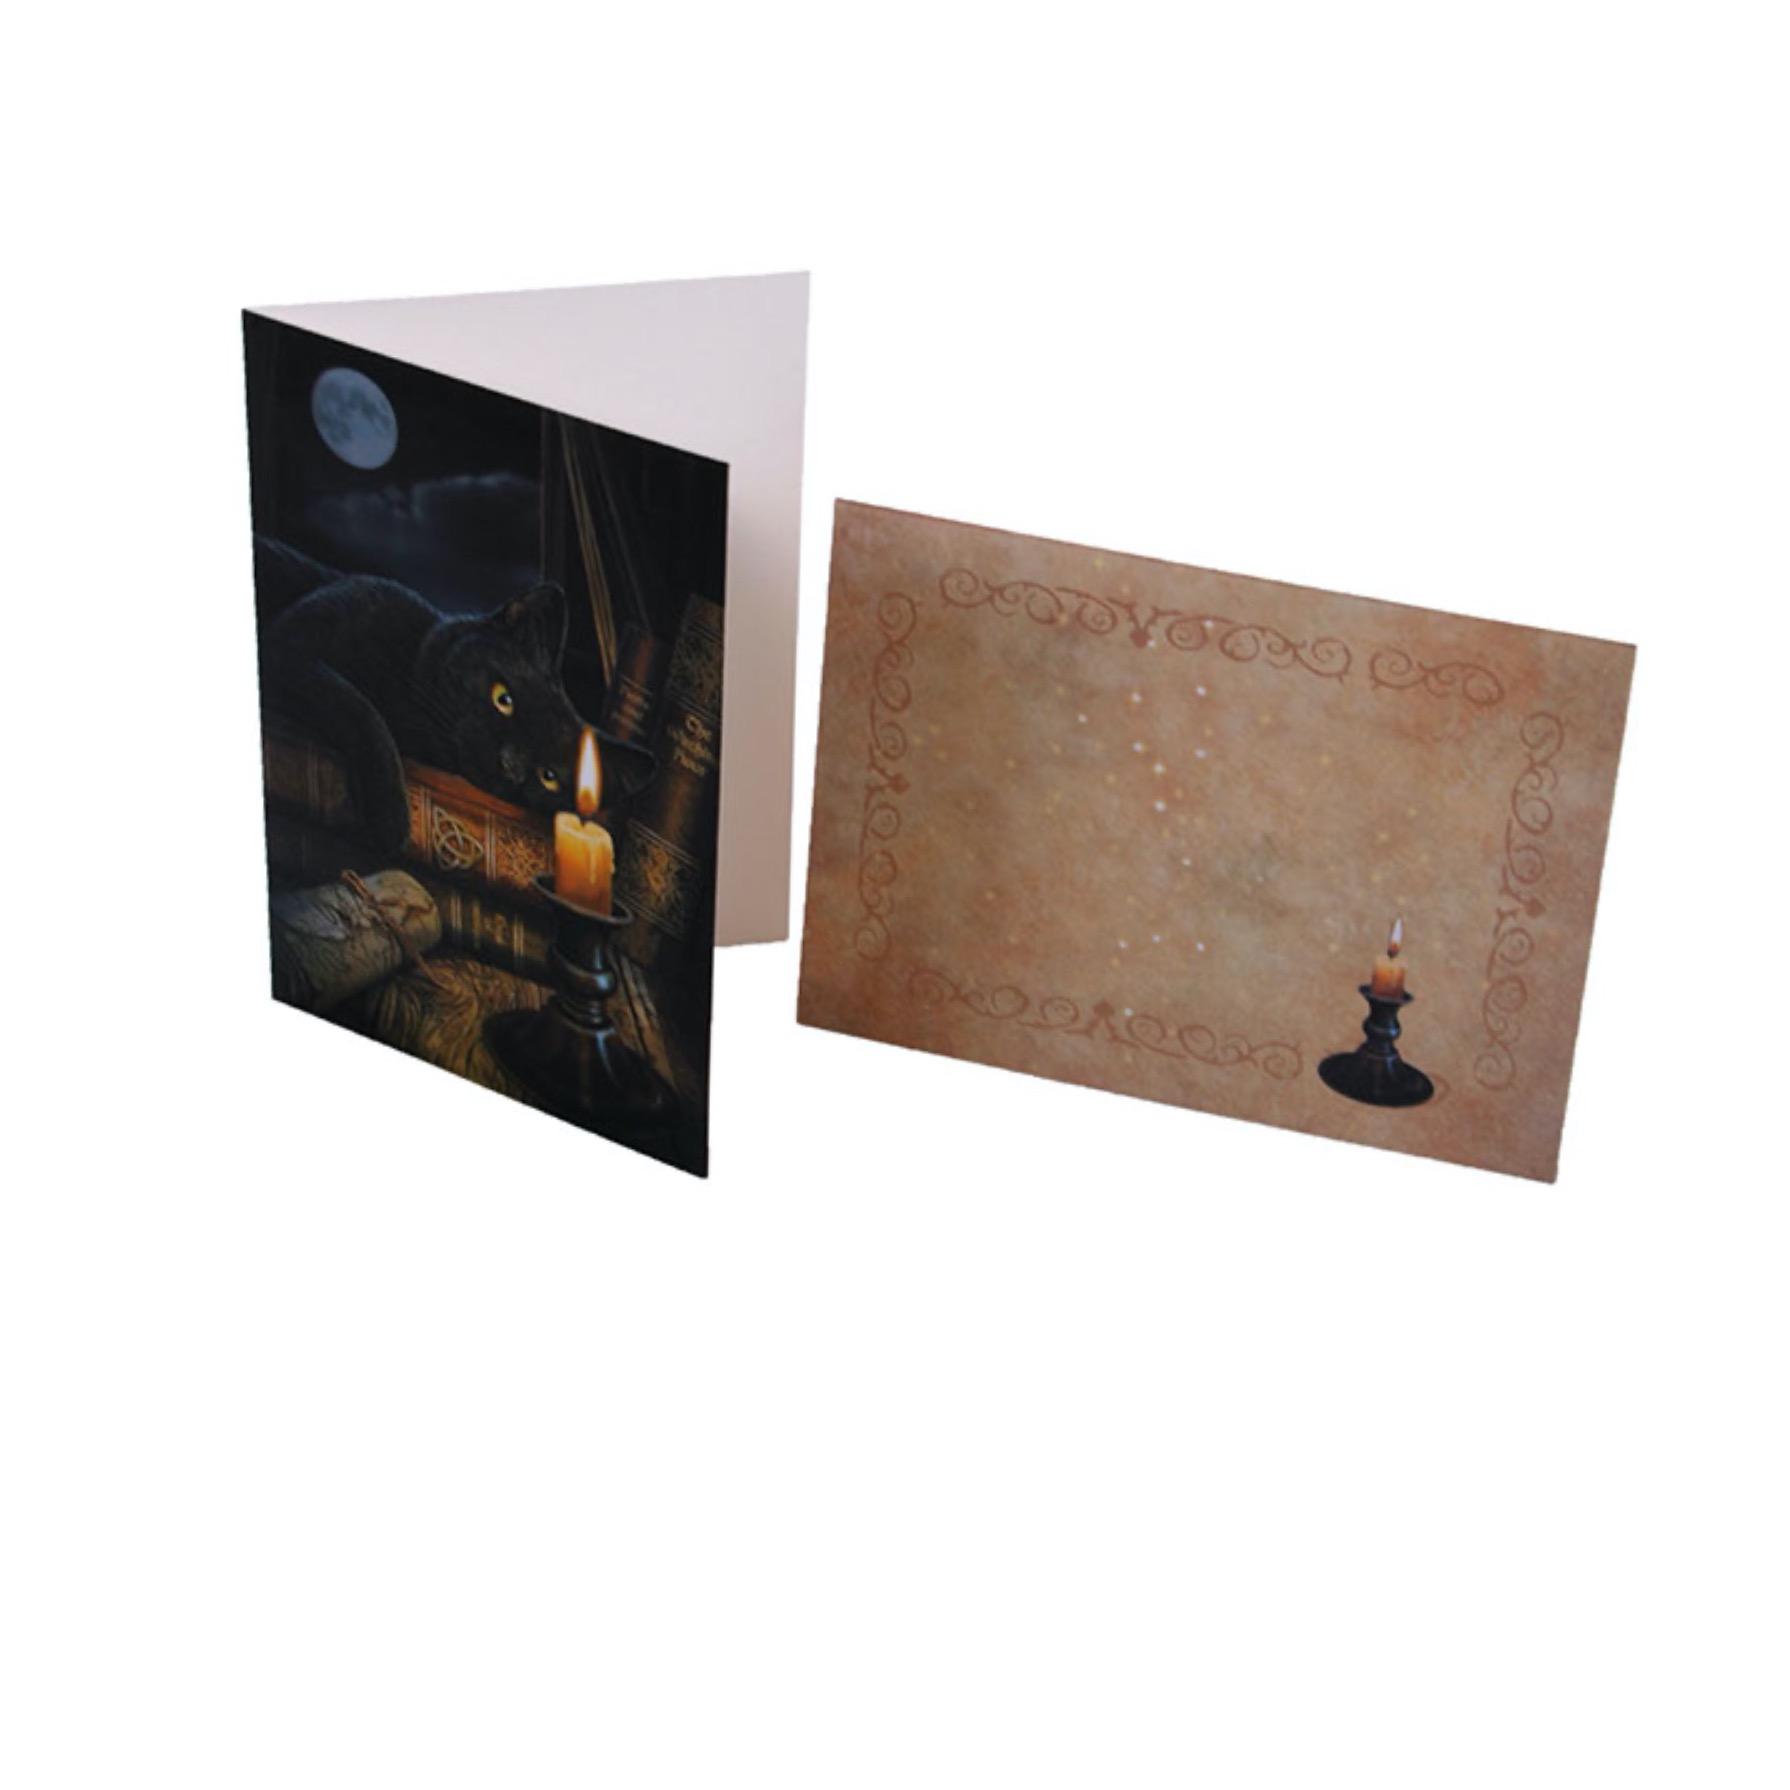 Cartoleria & Ufficio